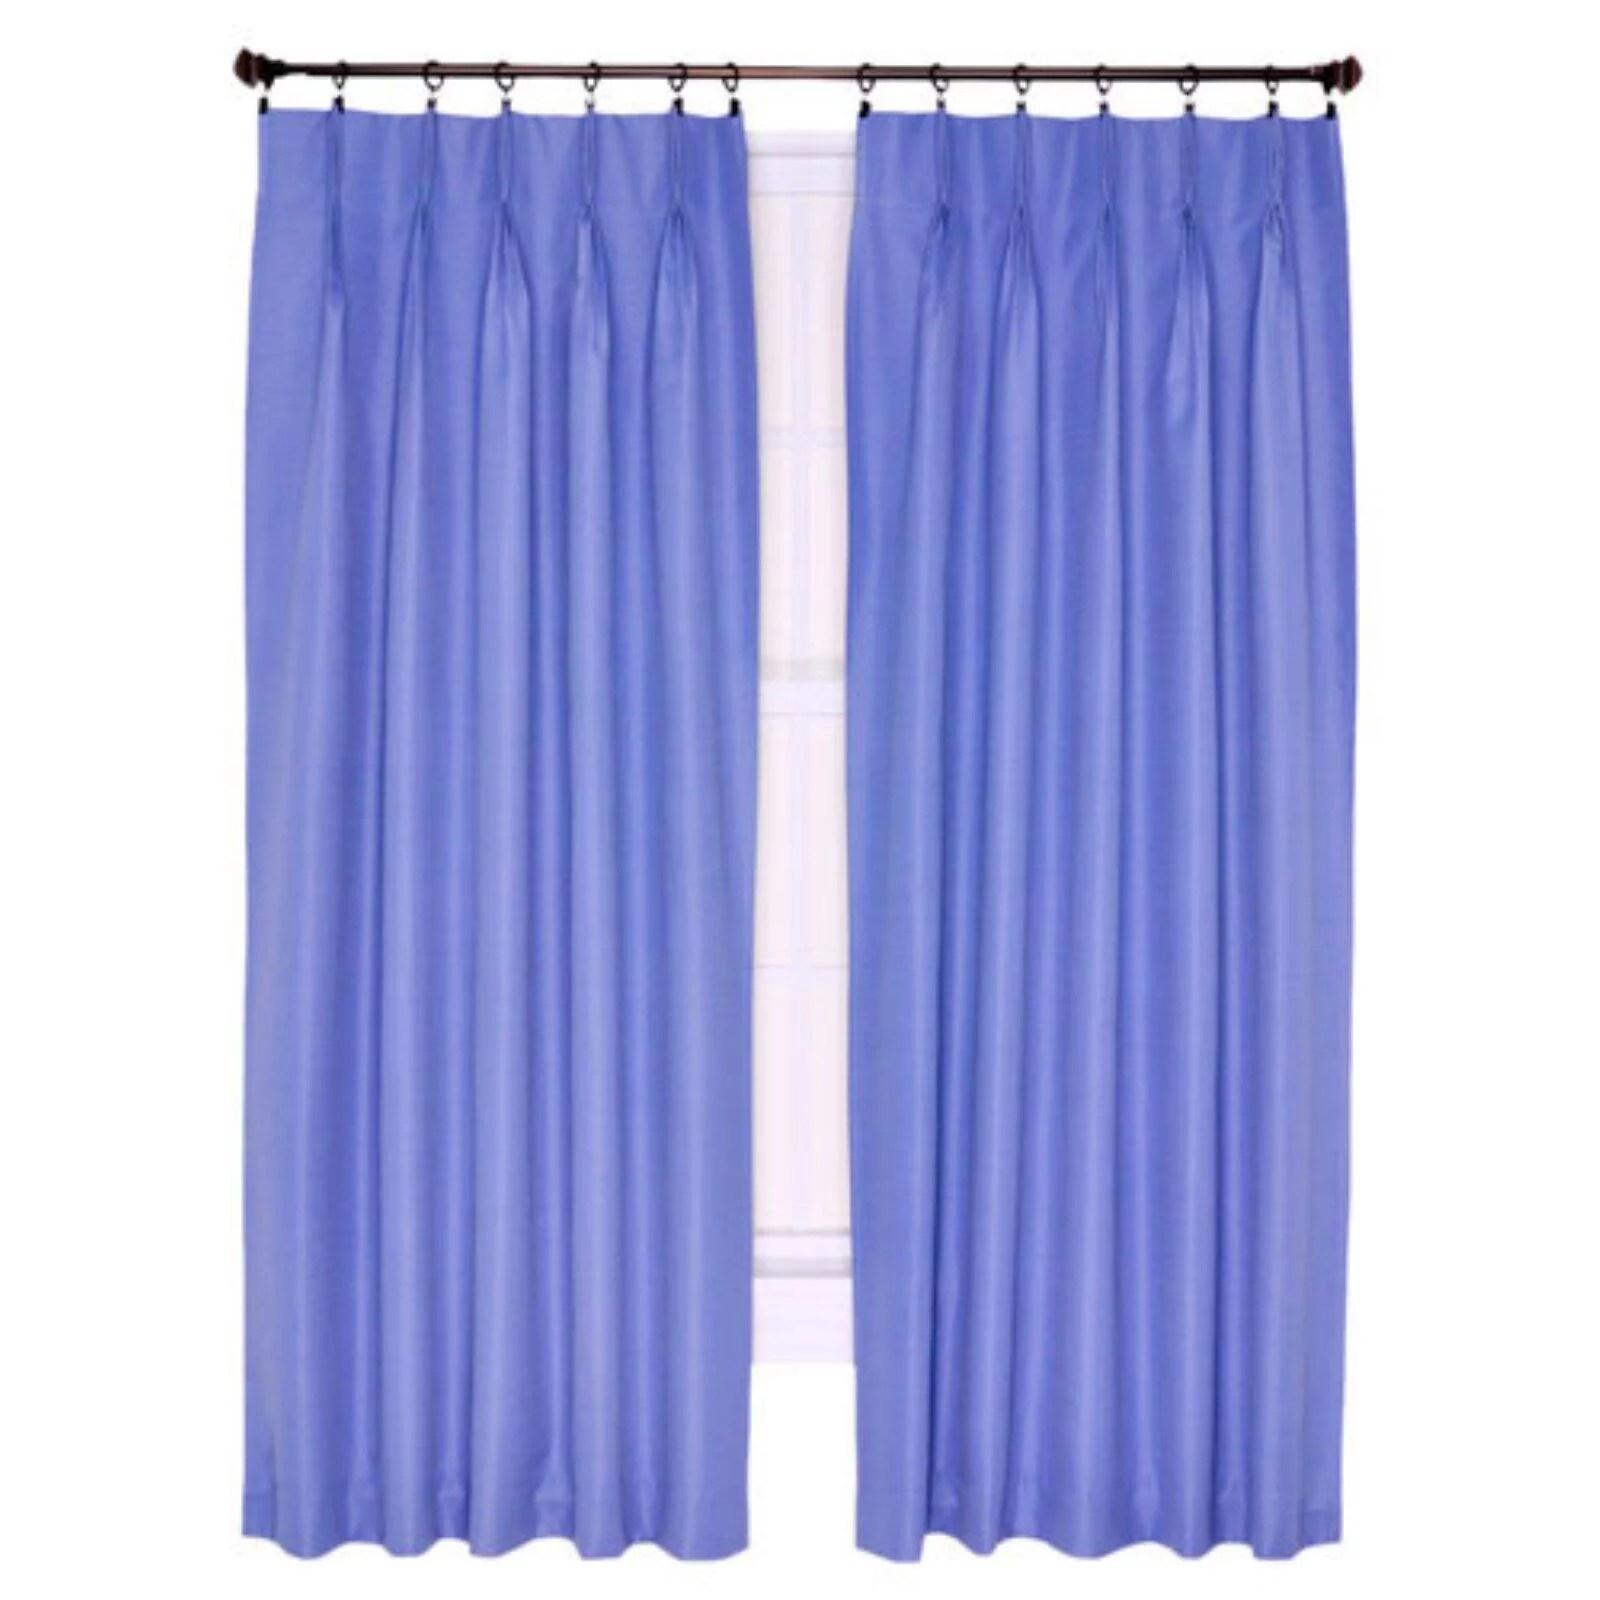 ellis crosby pinch pleat patio panel curtain walmart com